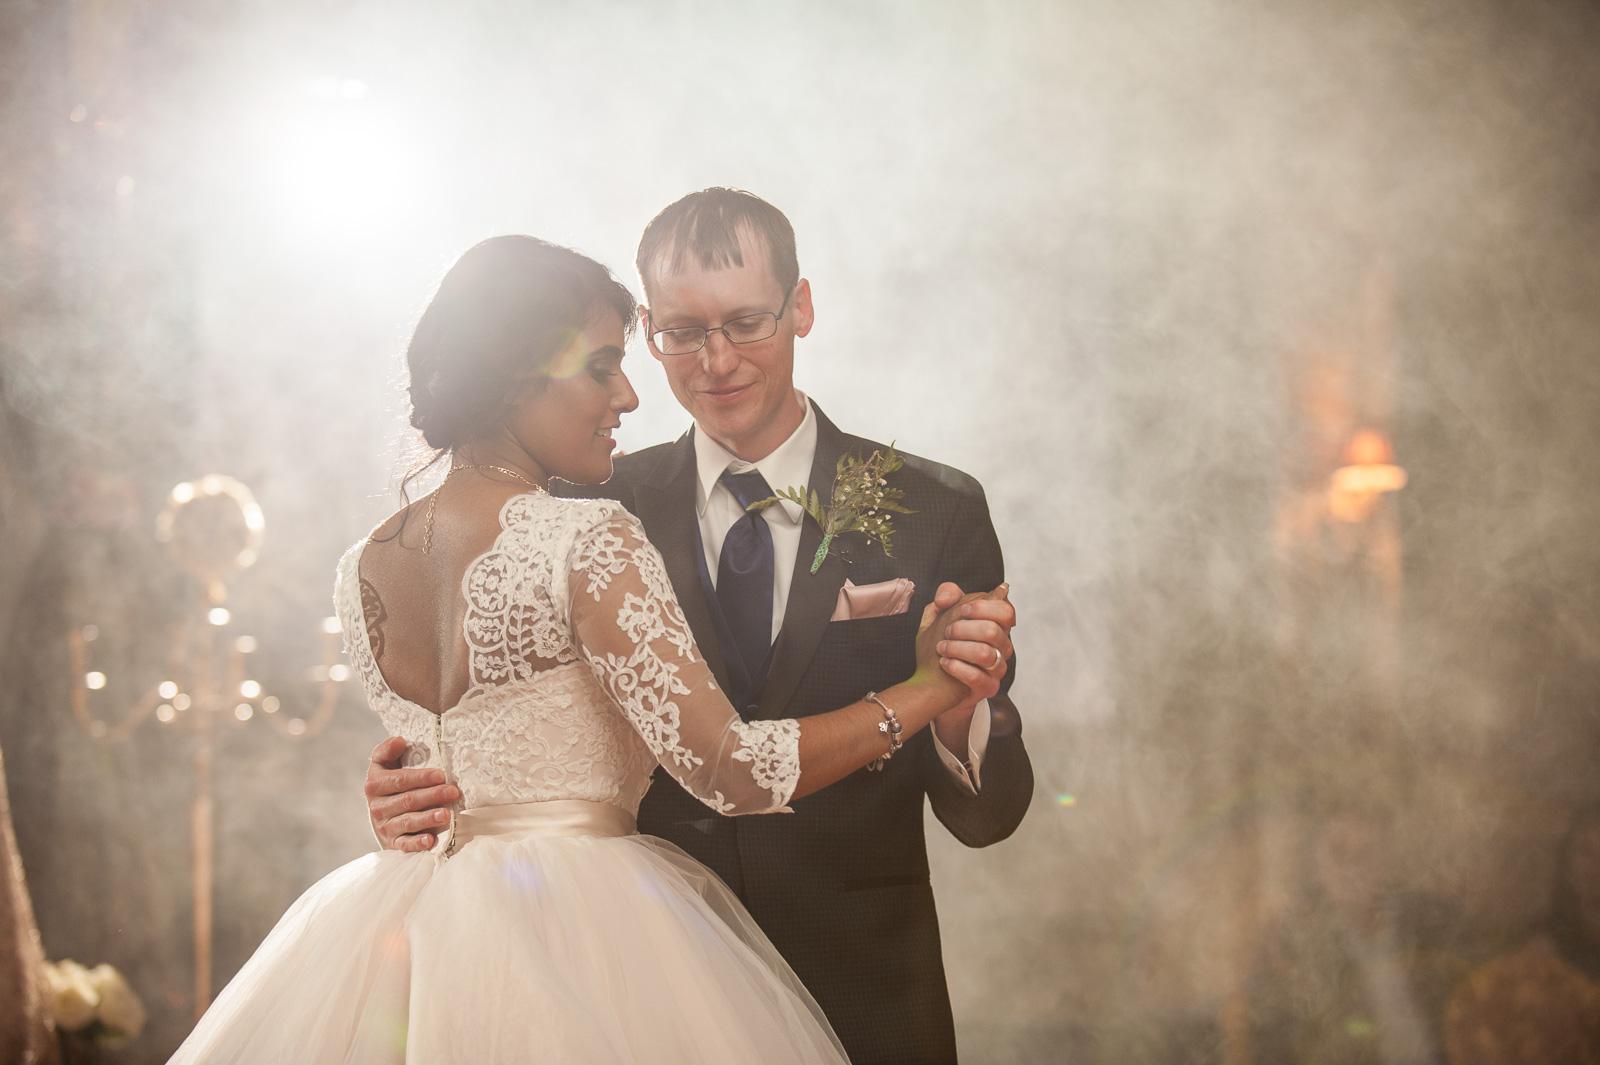 bc-wedding-photographers-paradise-banquet-hall-wedding-35.jpg